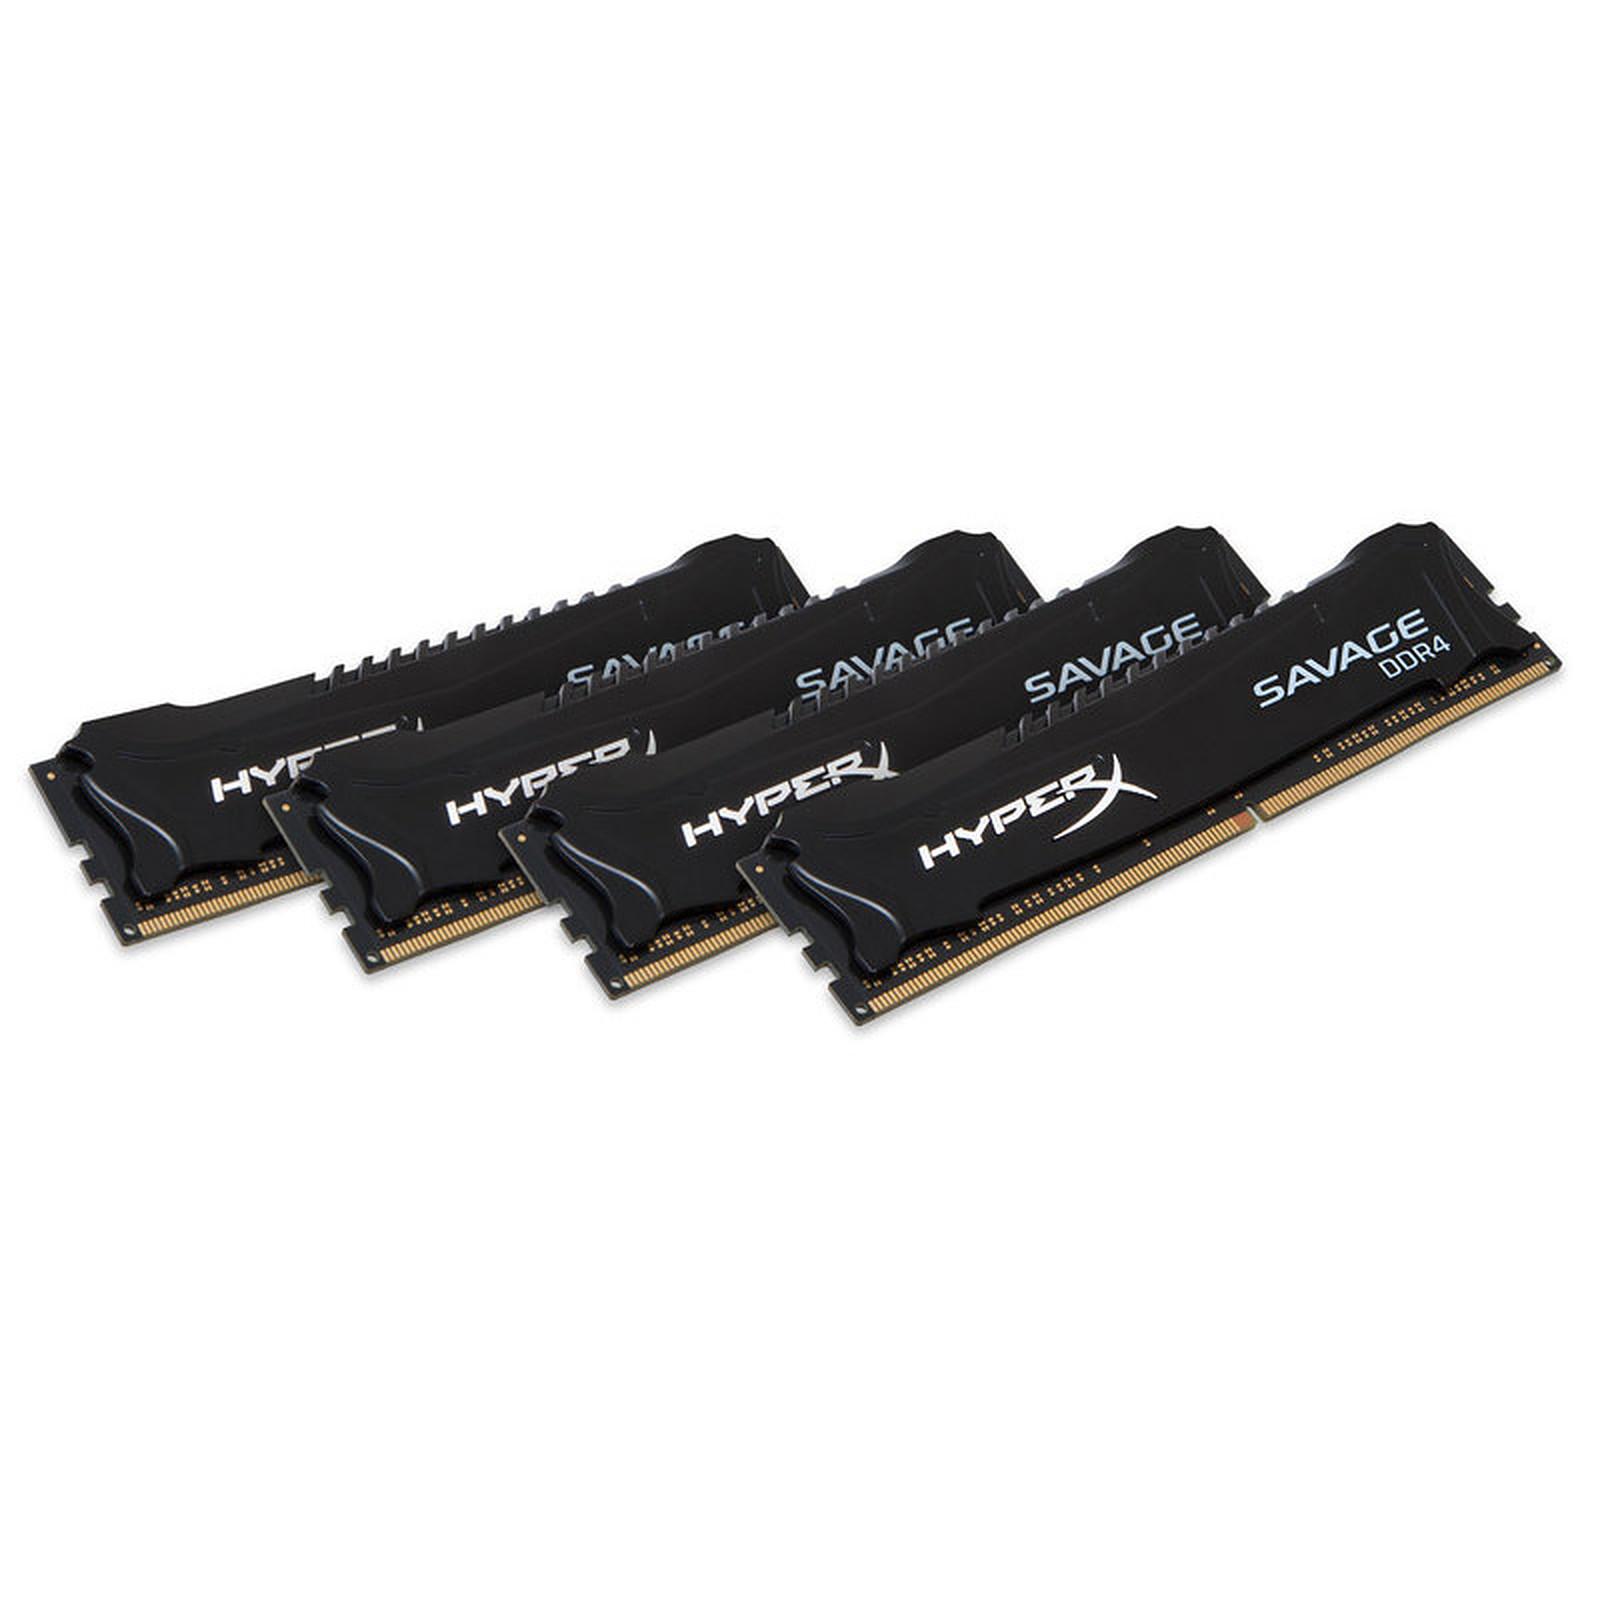 HyperX Savage Noir 16 Go (4x 4Go) DDR4 2133 MHz CL13